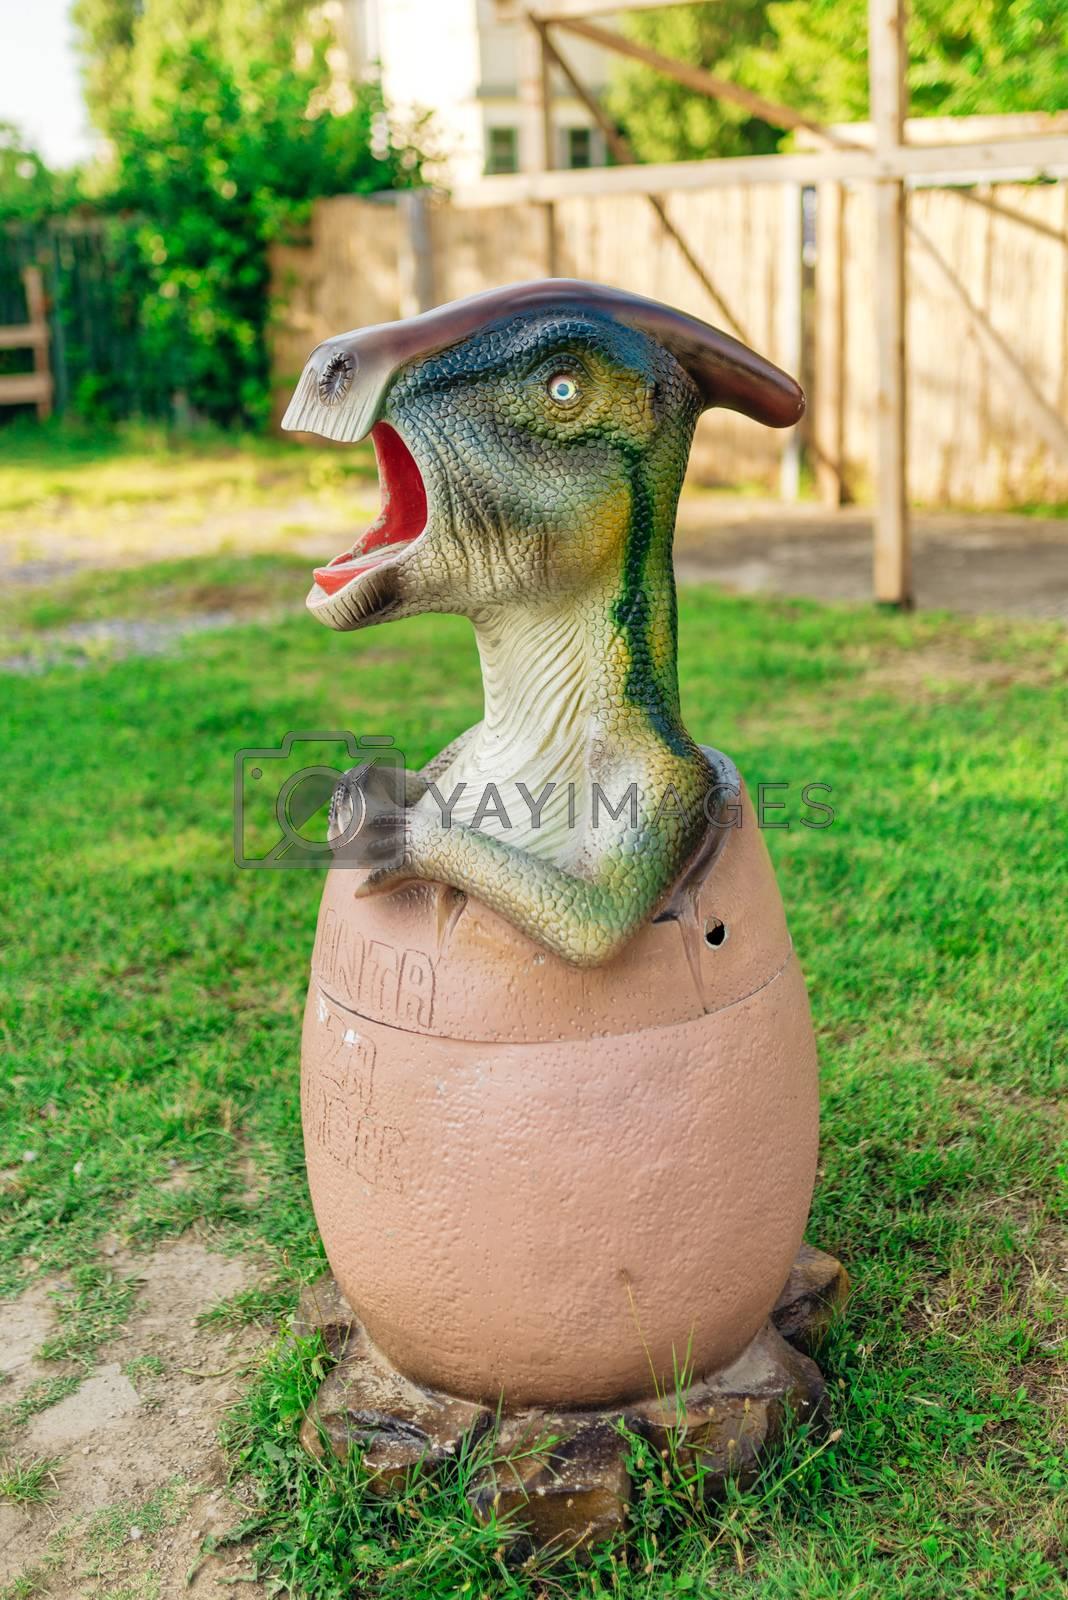 NOVI SAD, SERBIA - AUGUST 7, 2016: Small dinosaur trash bin toy from themed entertainment Dino Park in Novi Sad.